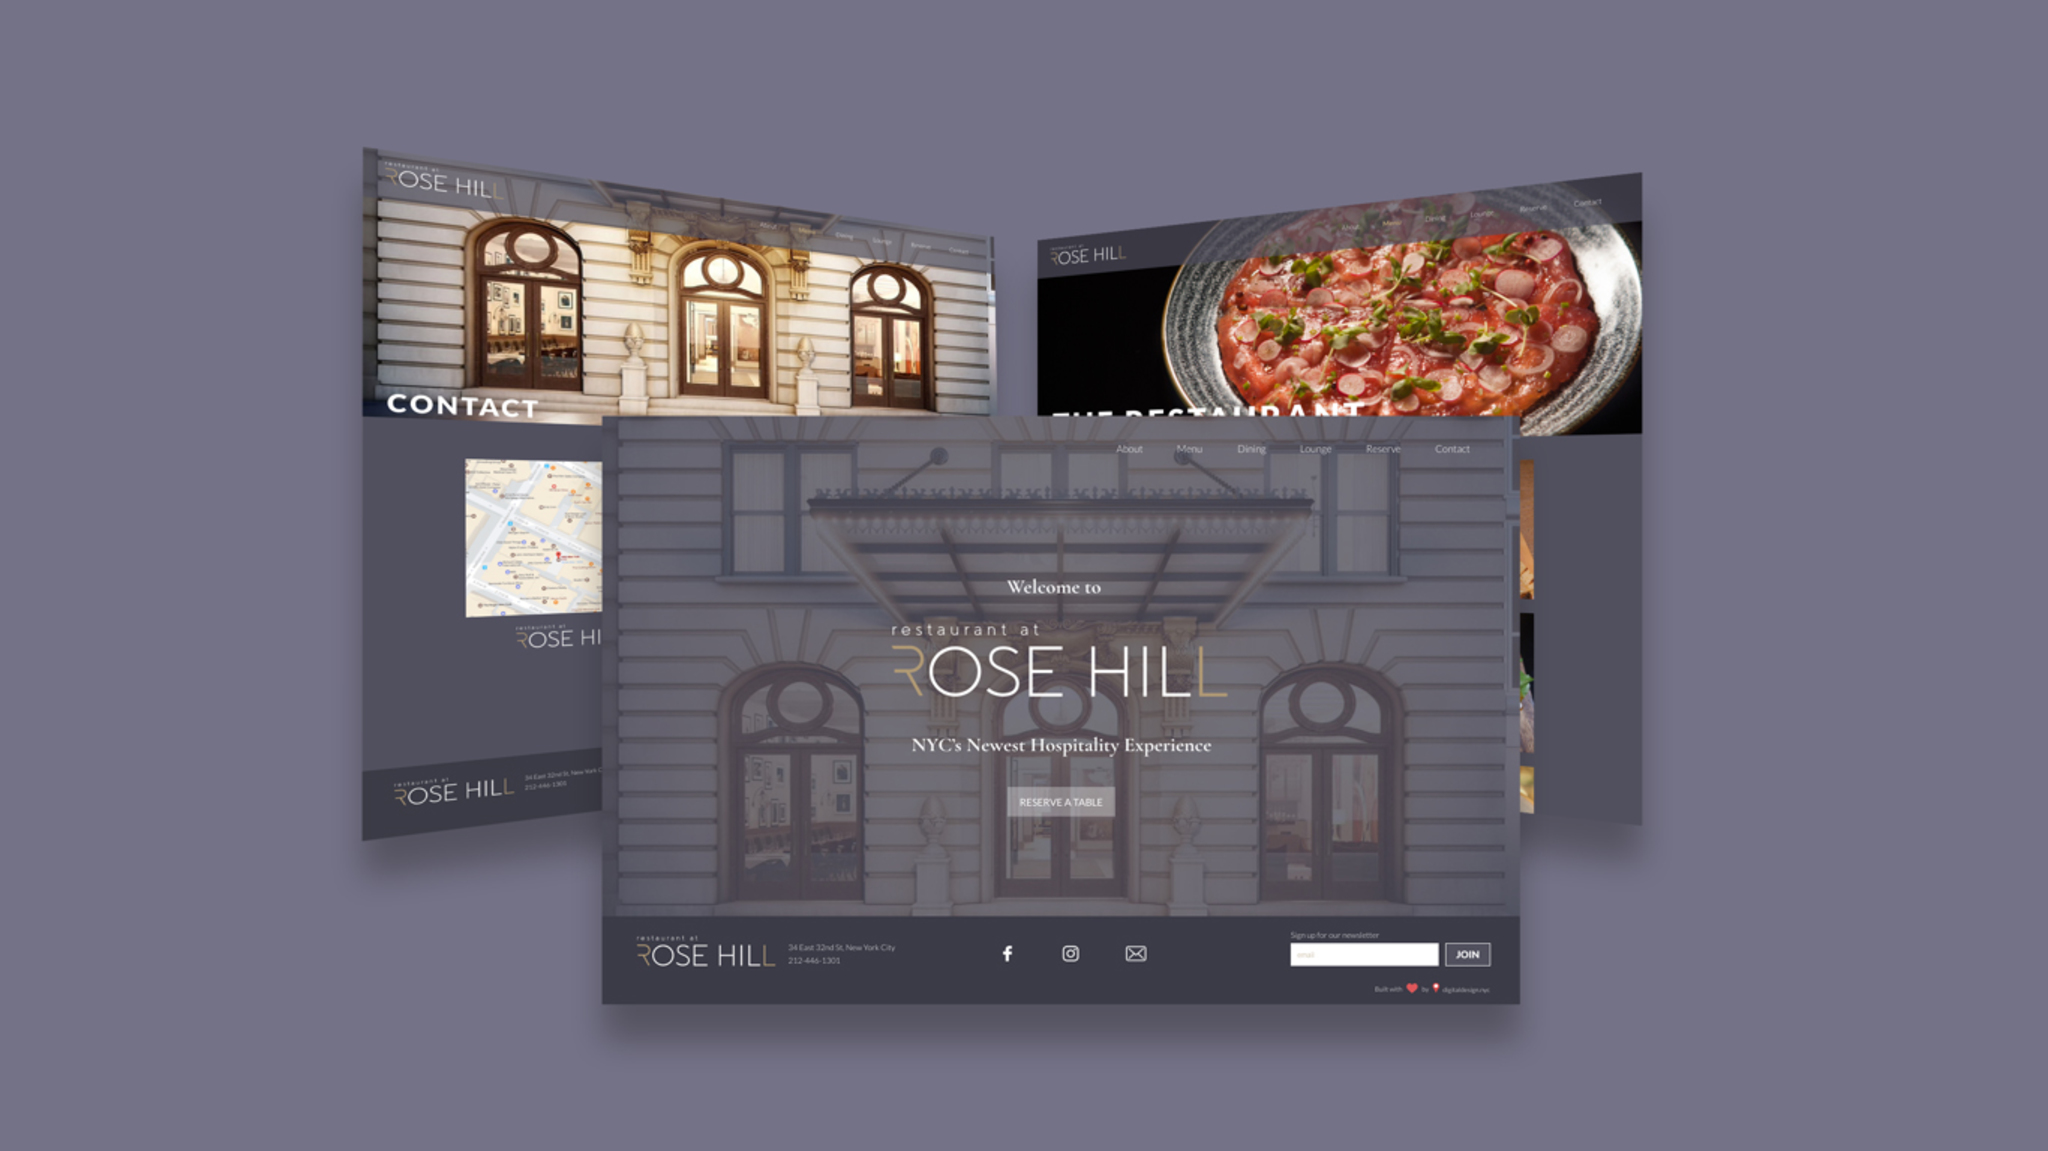 Rose Hill - Development